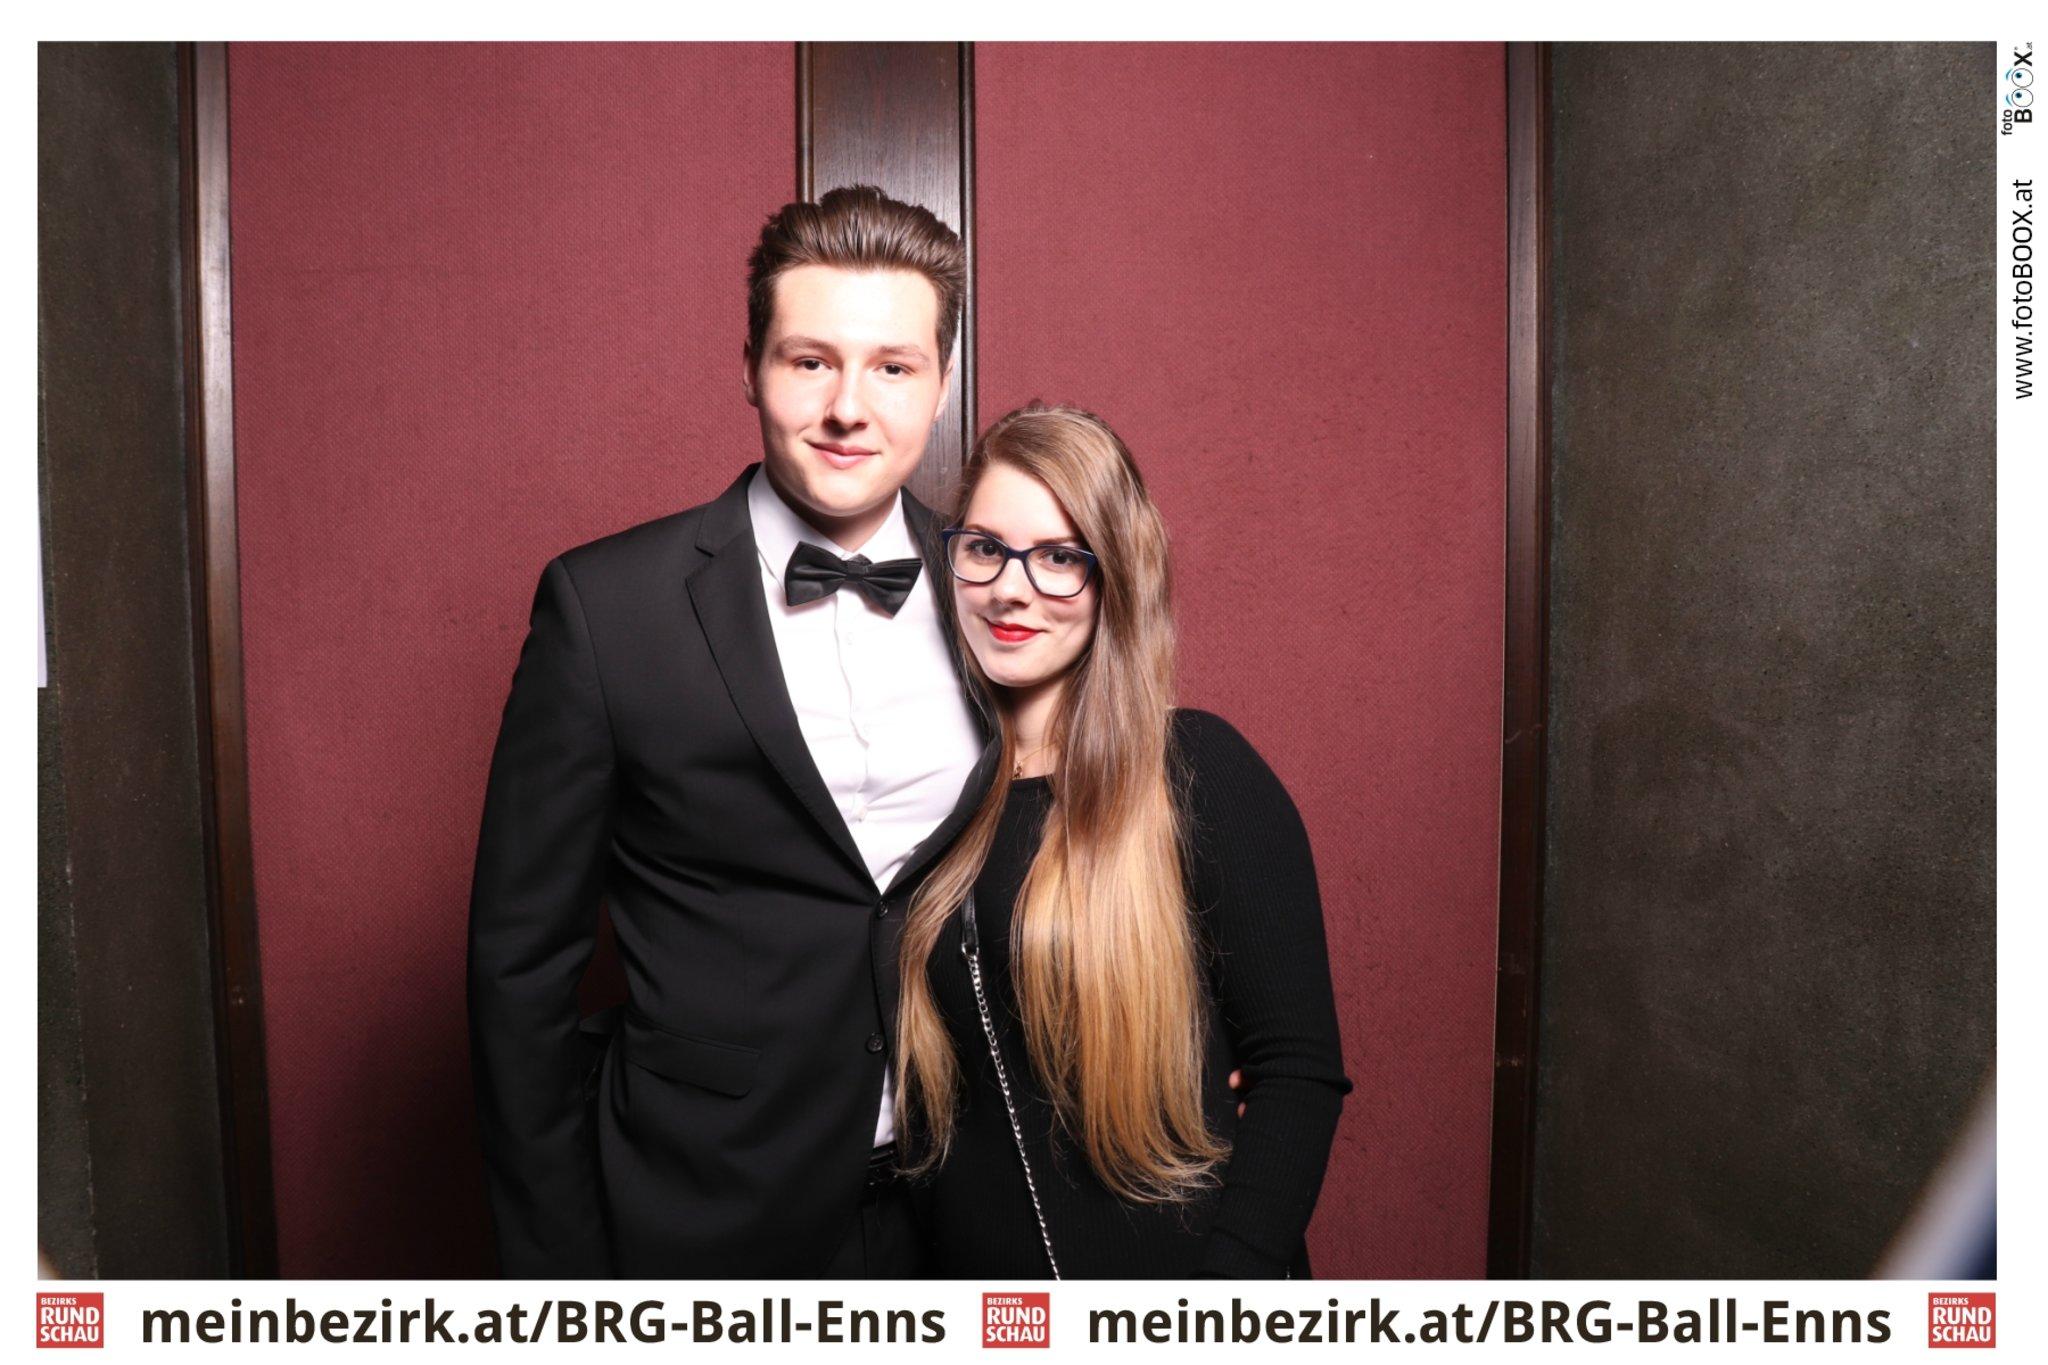 Gtzens Singles Kreis Partnersuche Meine Stadt Groarl Enns